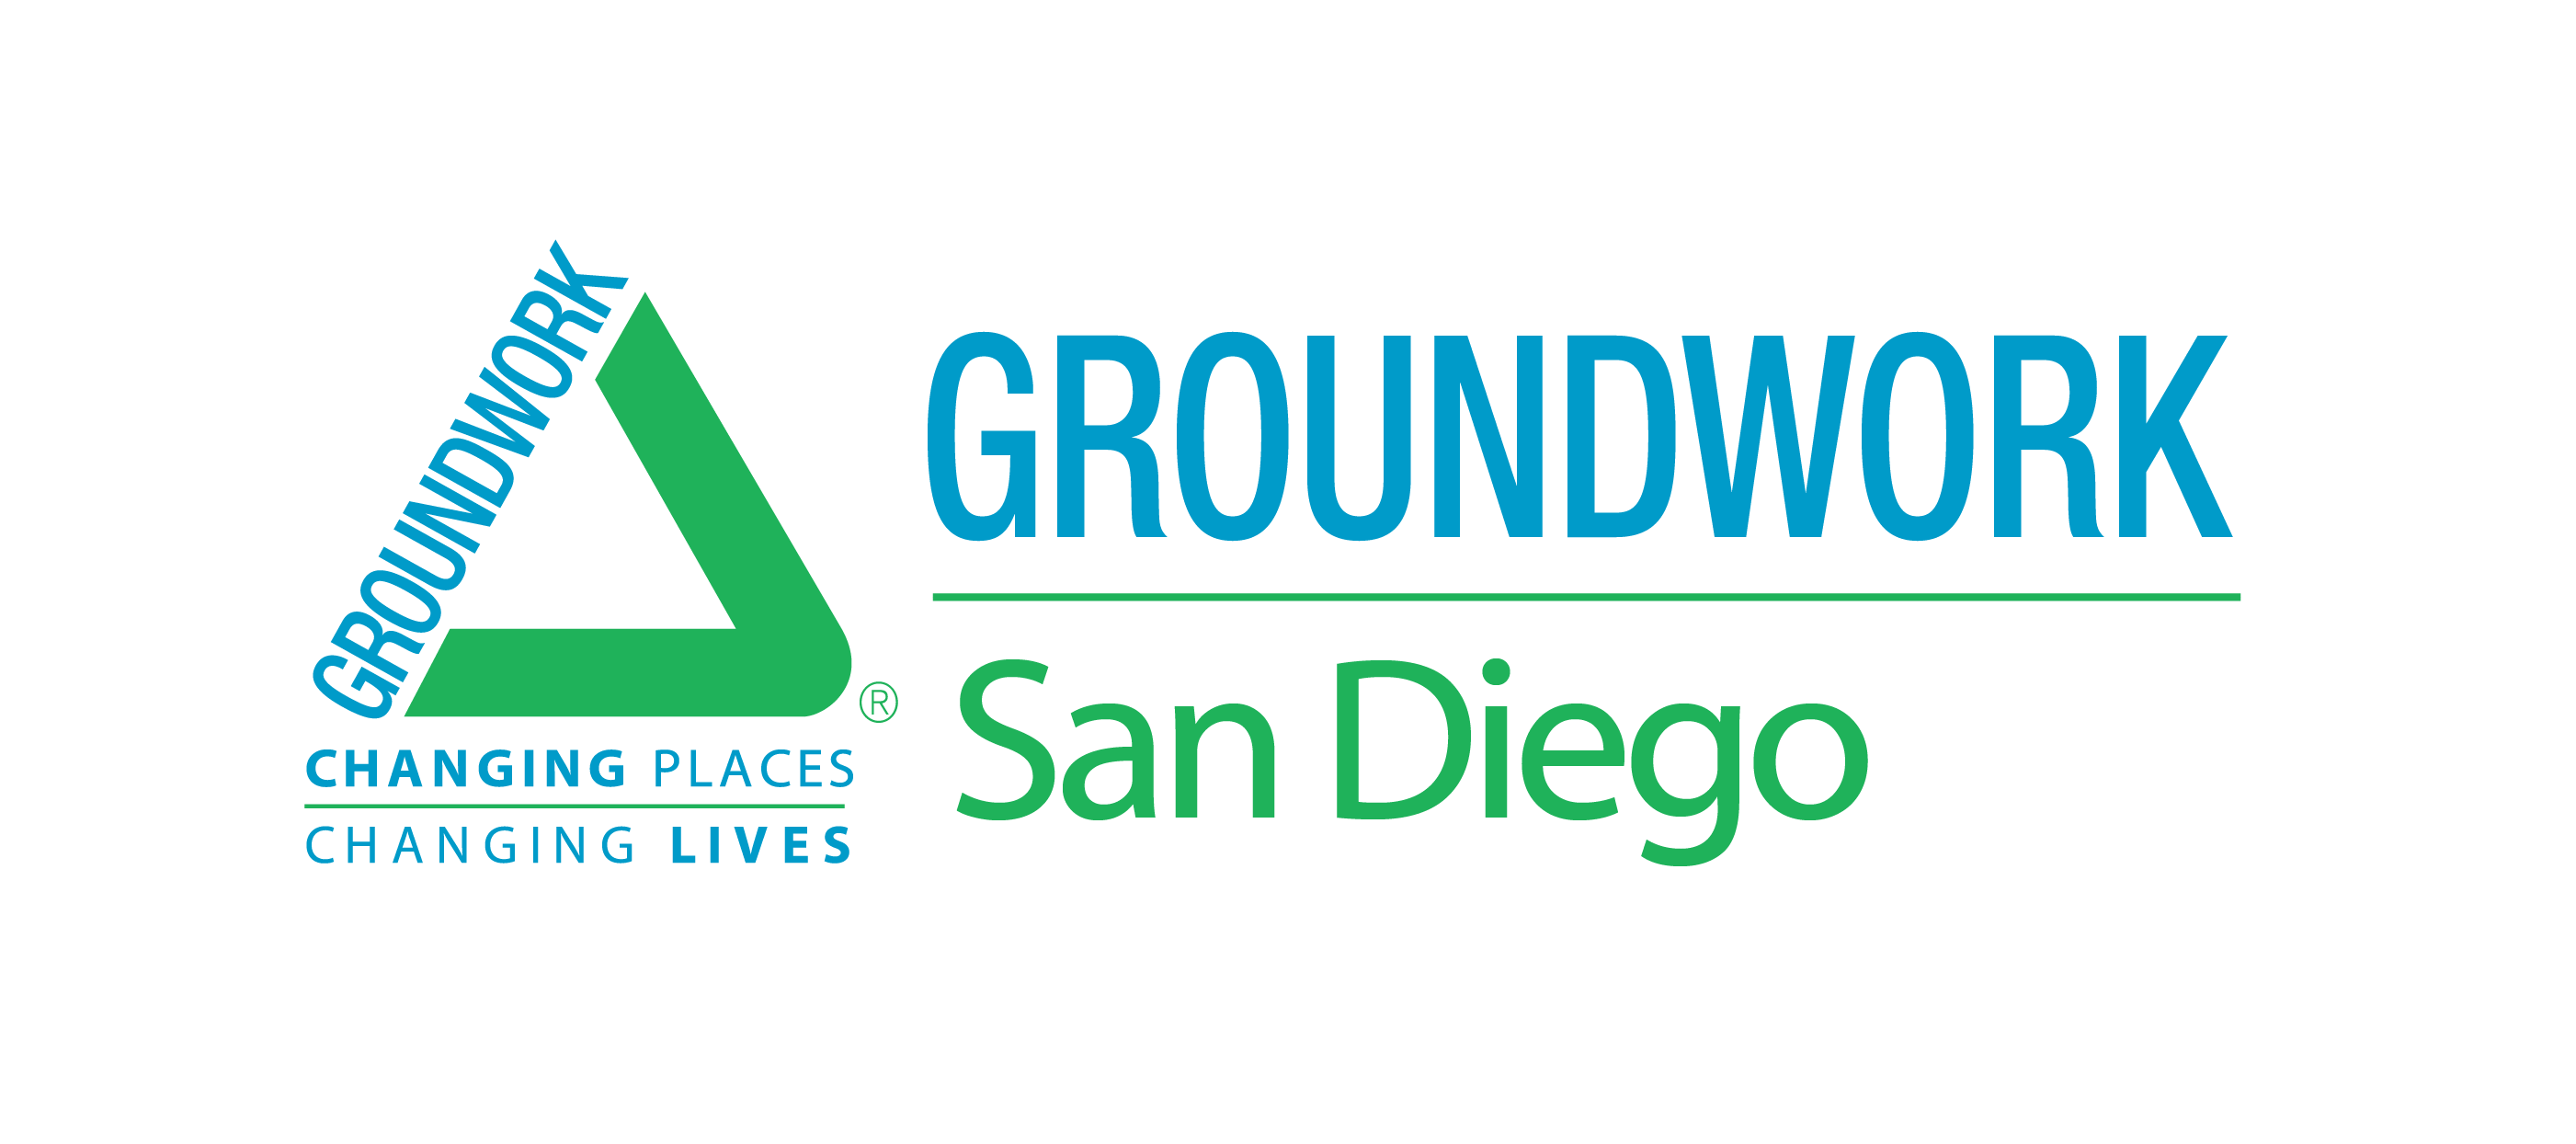 Groundwork San Diego-Chollas Creek